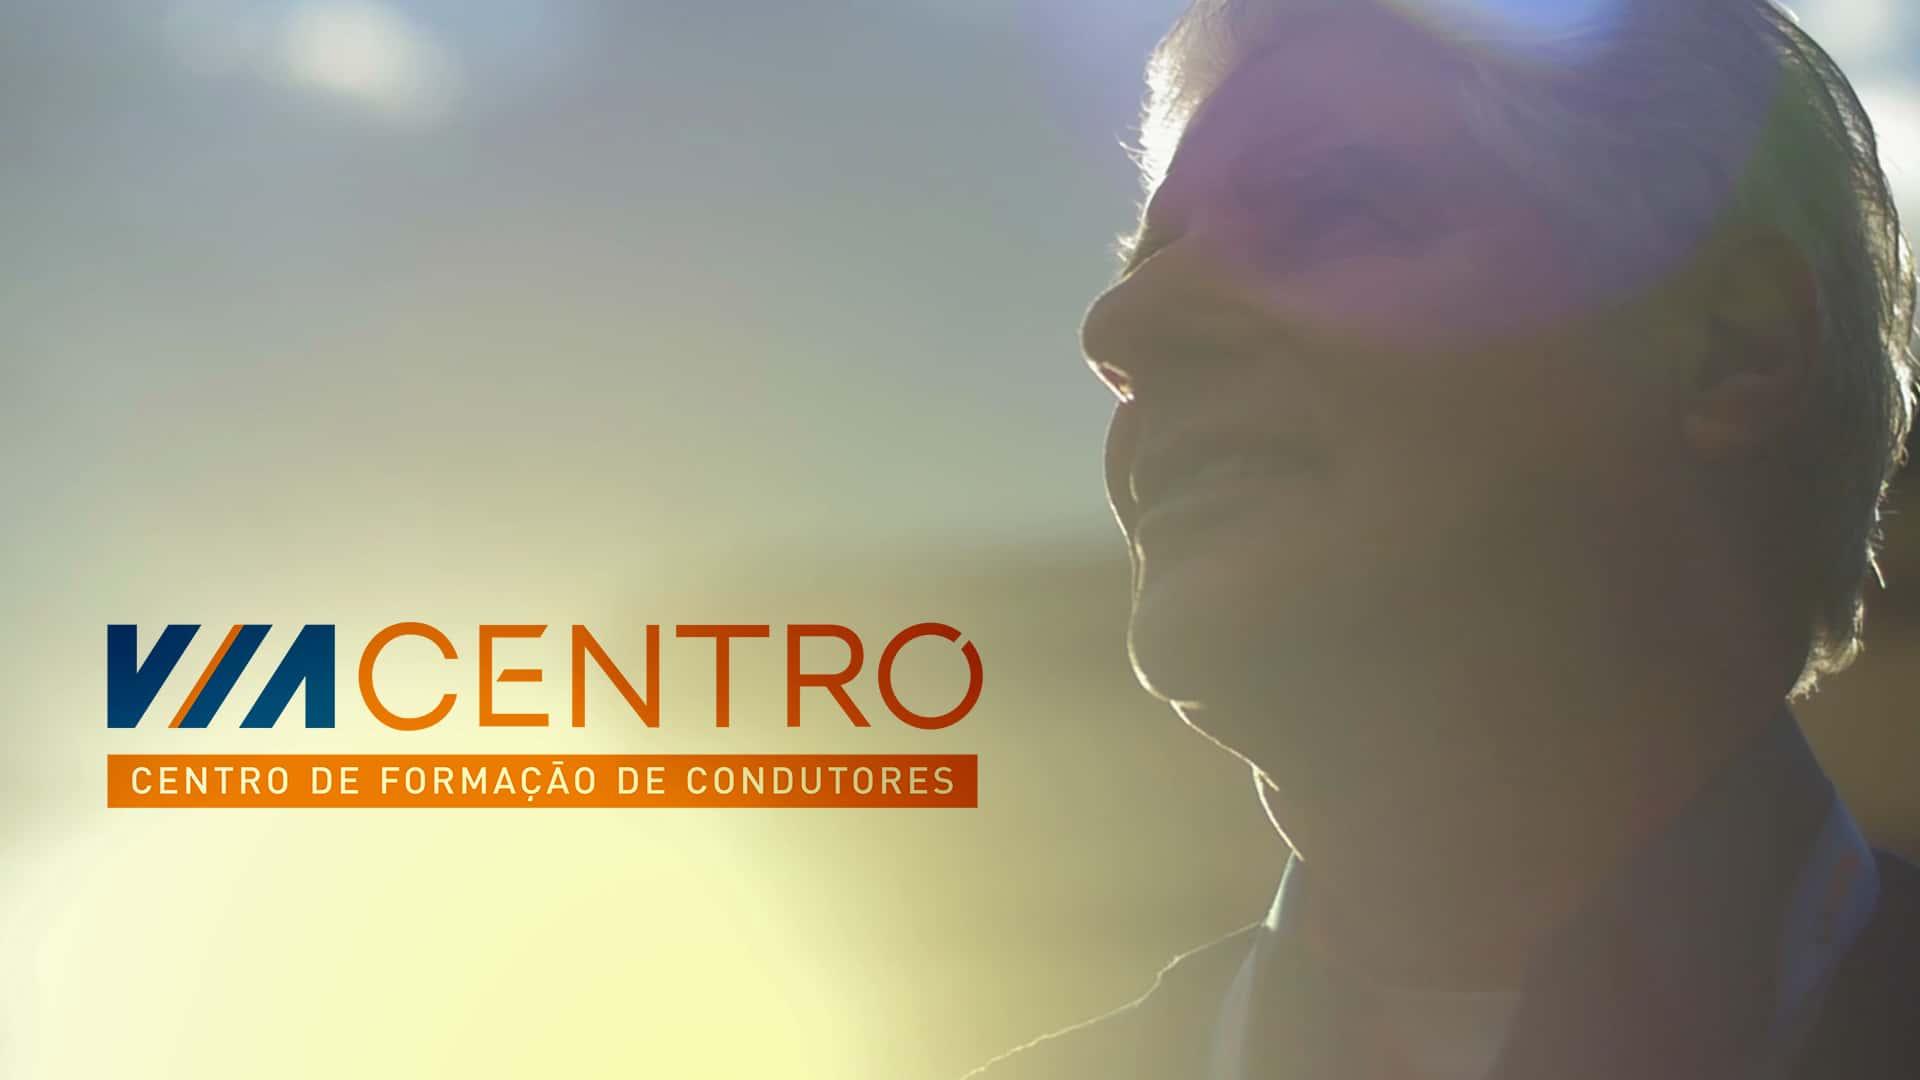 CFC Viacentro